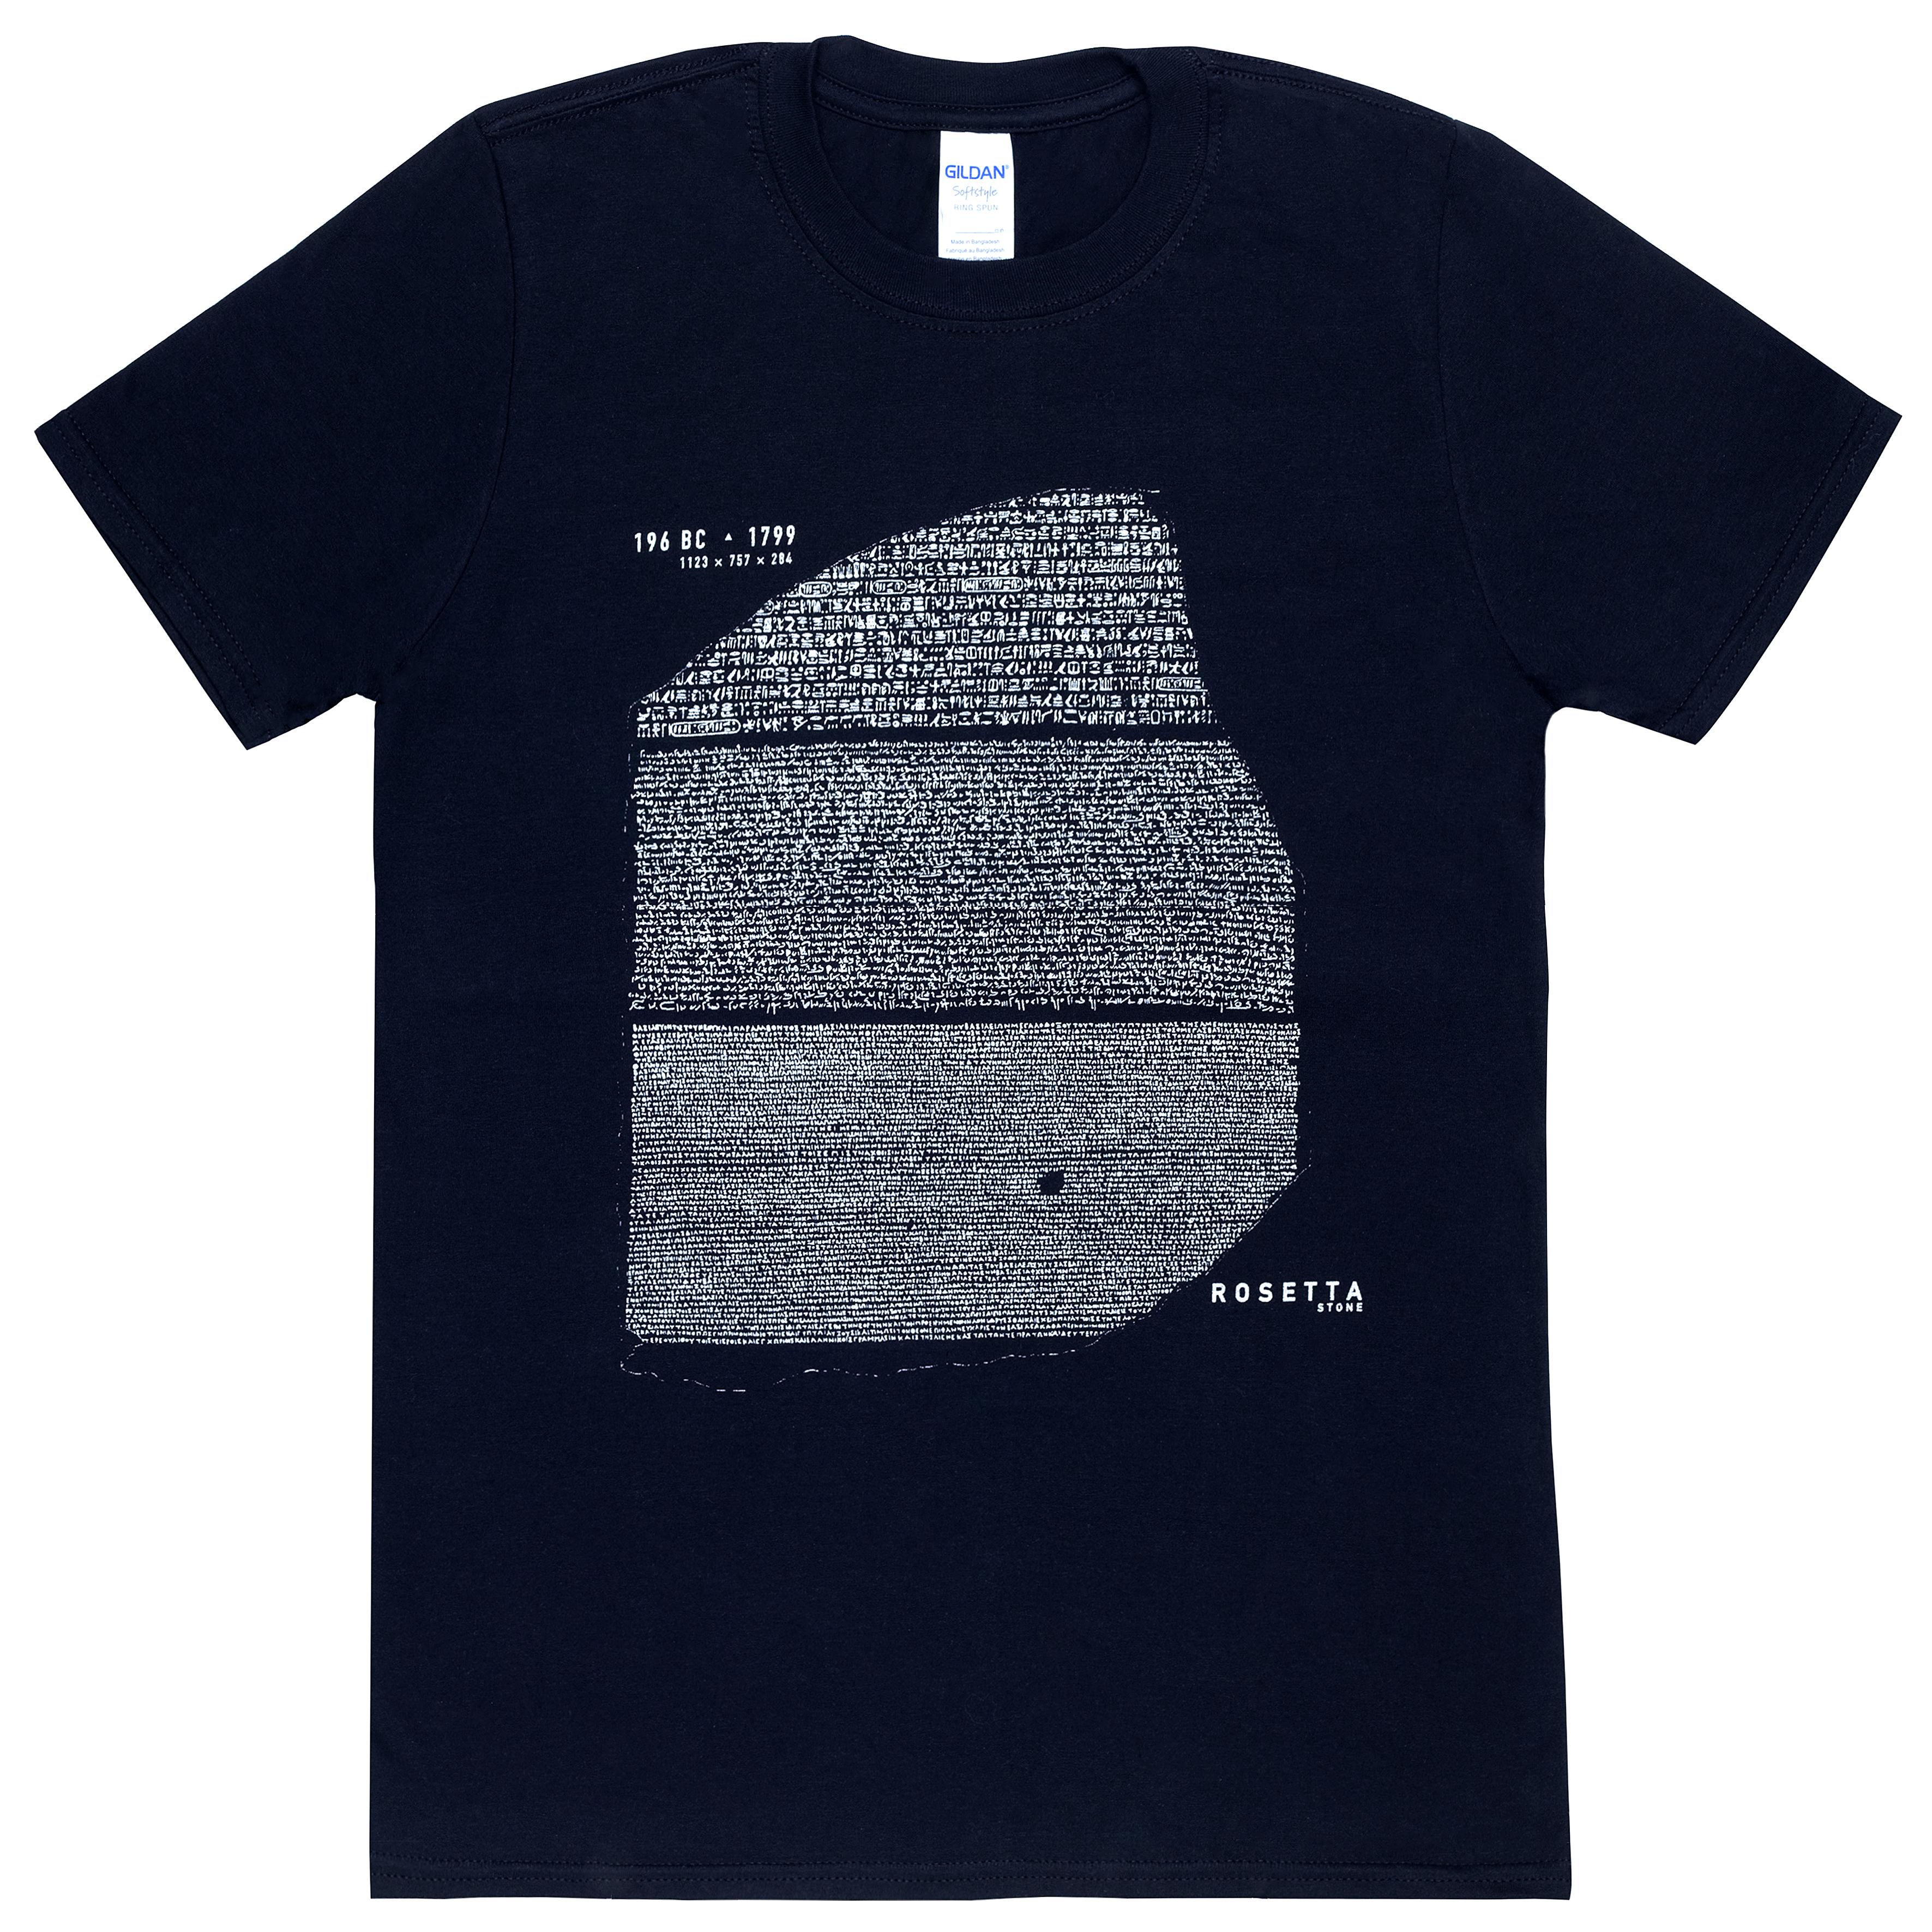 Black Rosetta Stone t-shirt (M)